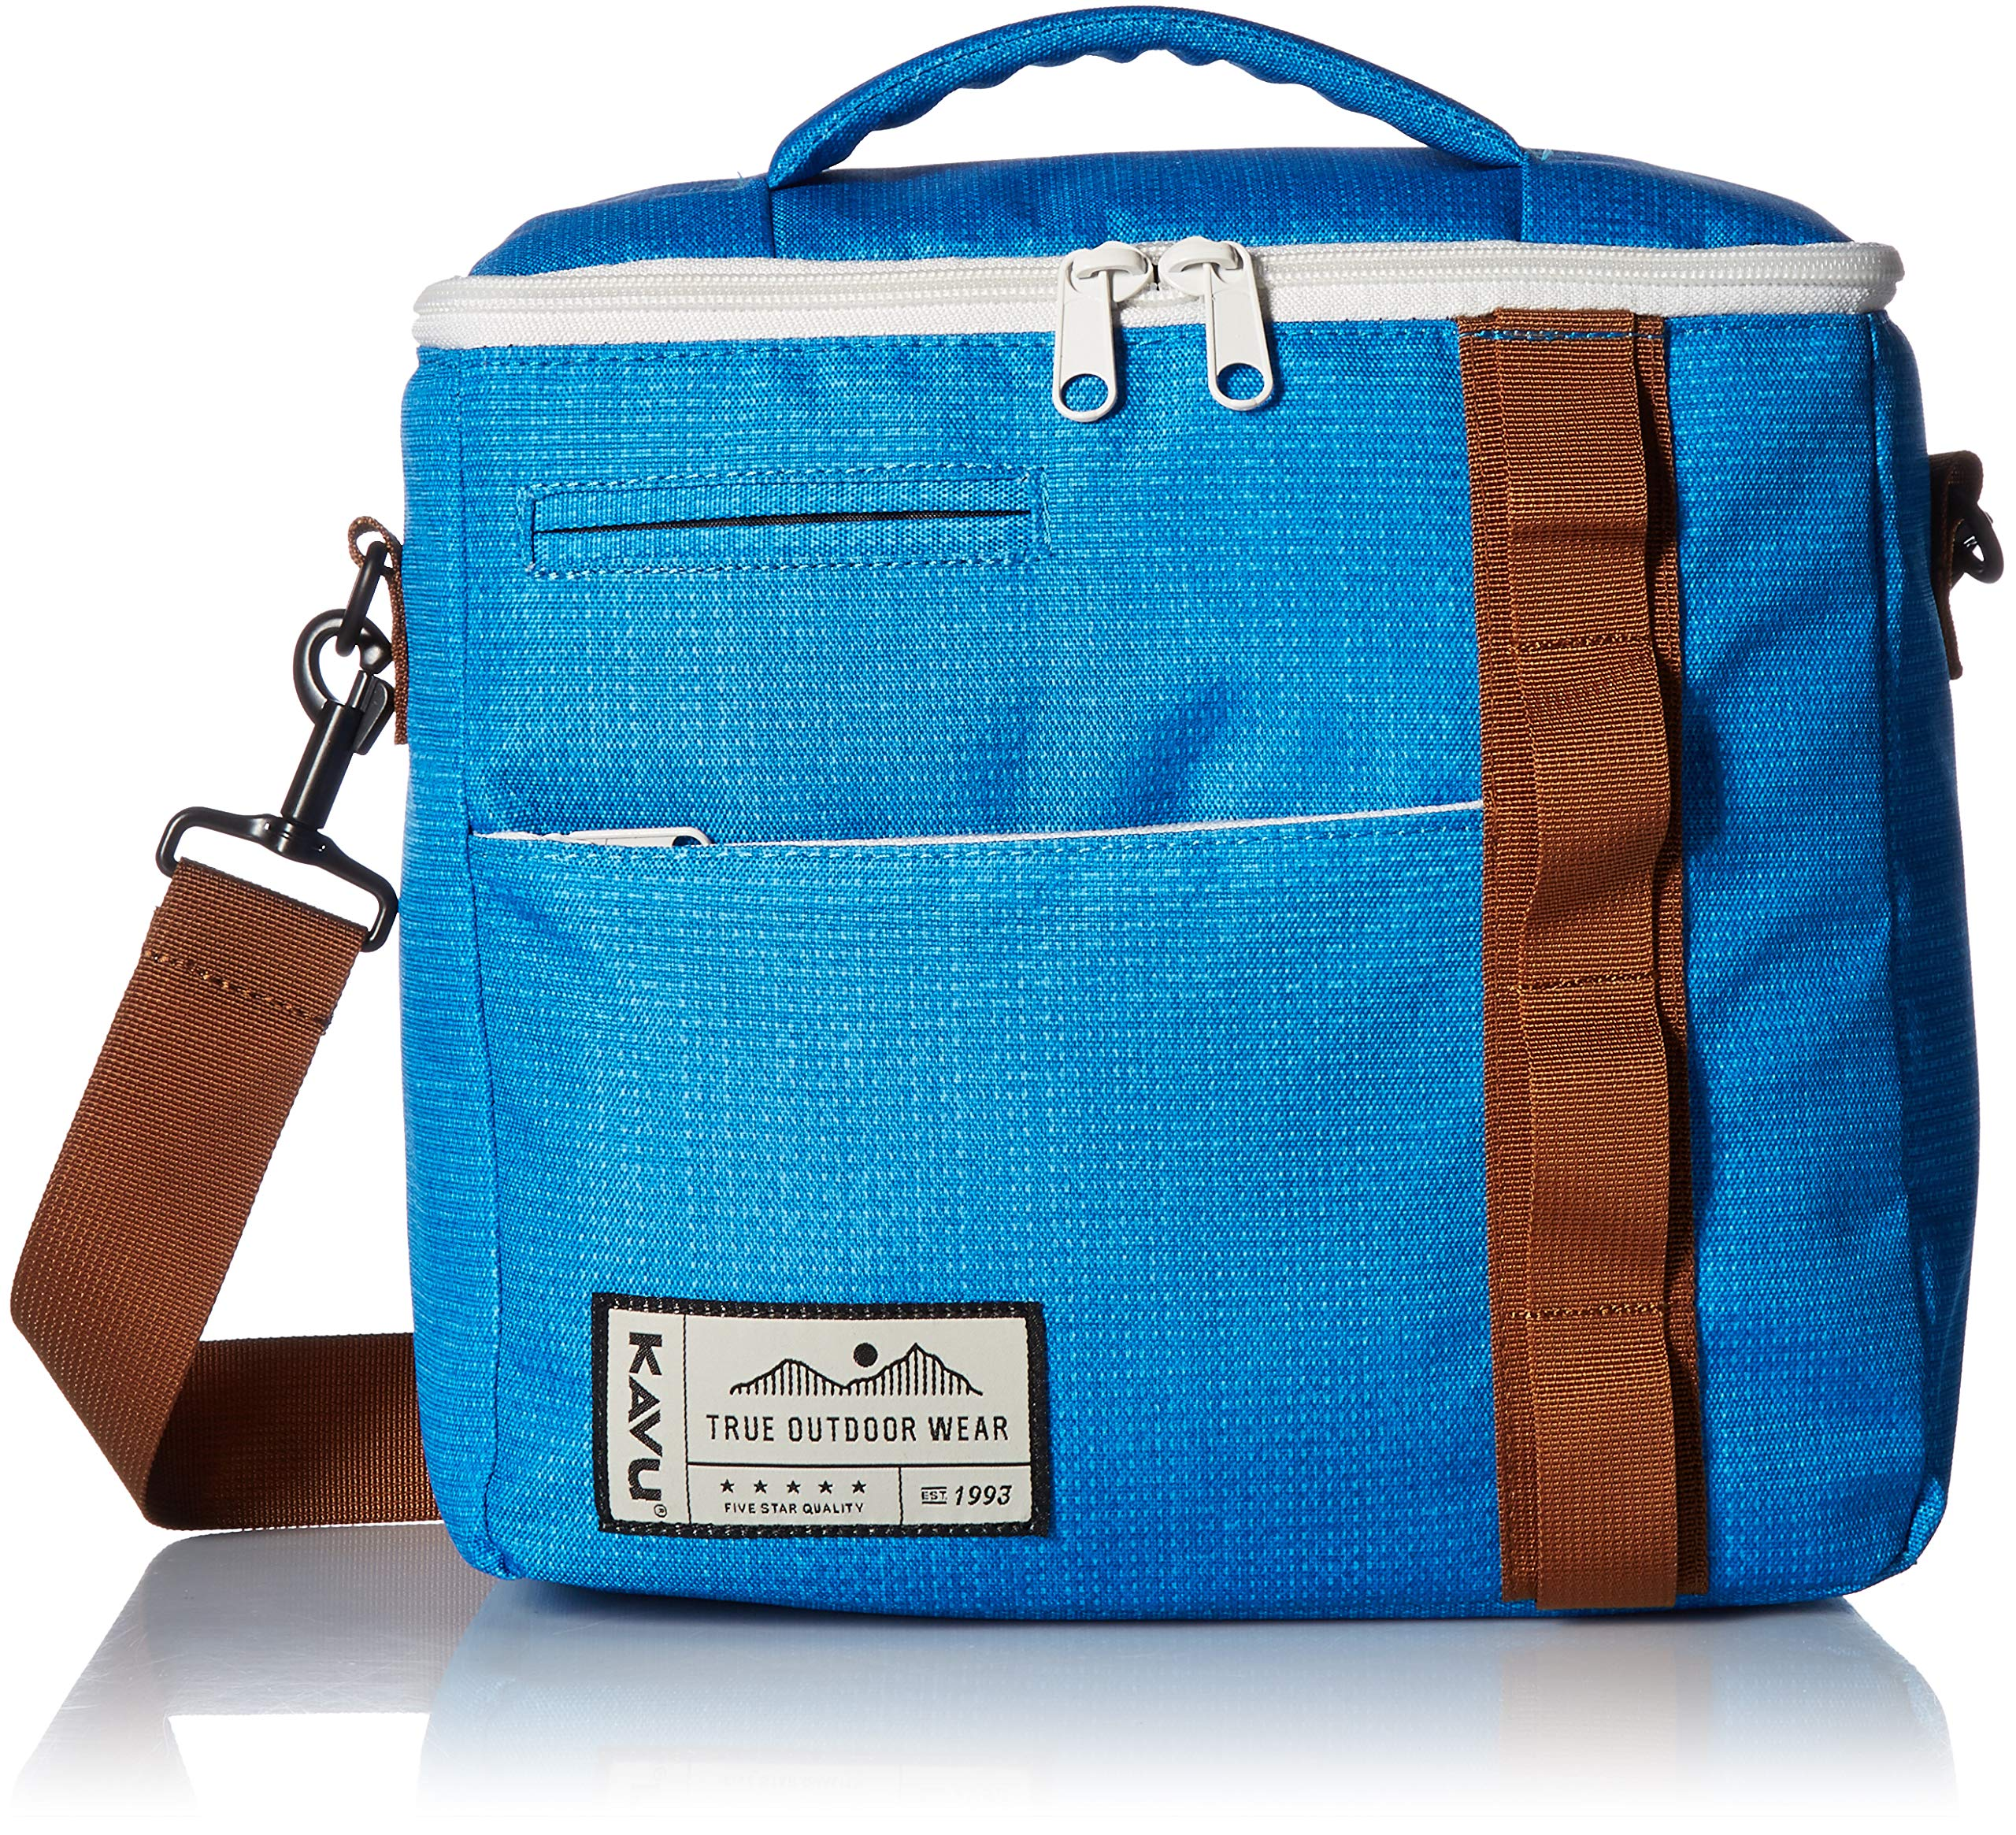 KAVU Women's Snack Sack Outdoor Backpacks, One